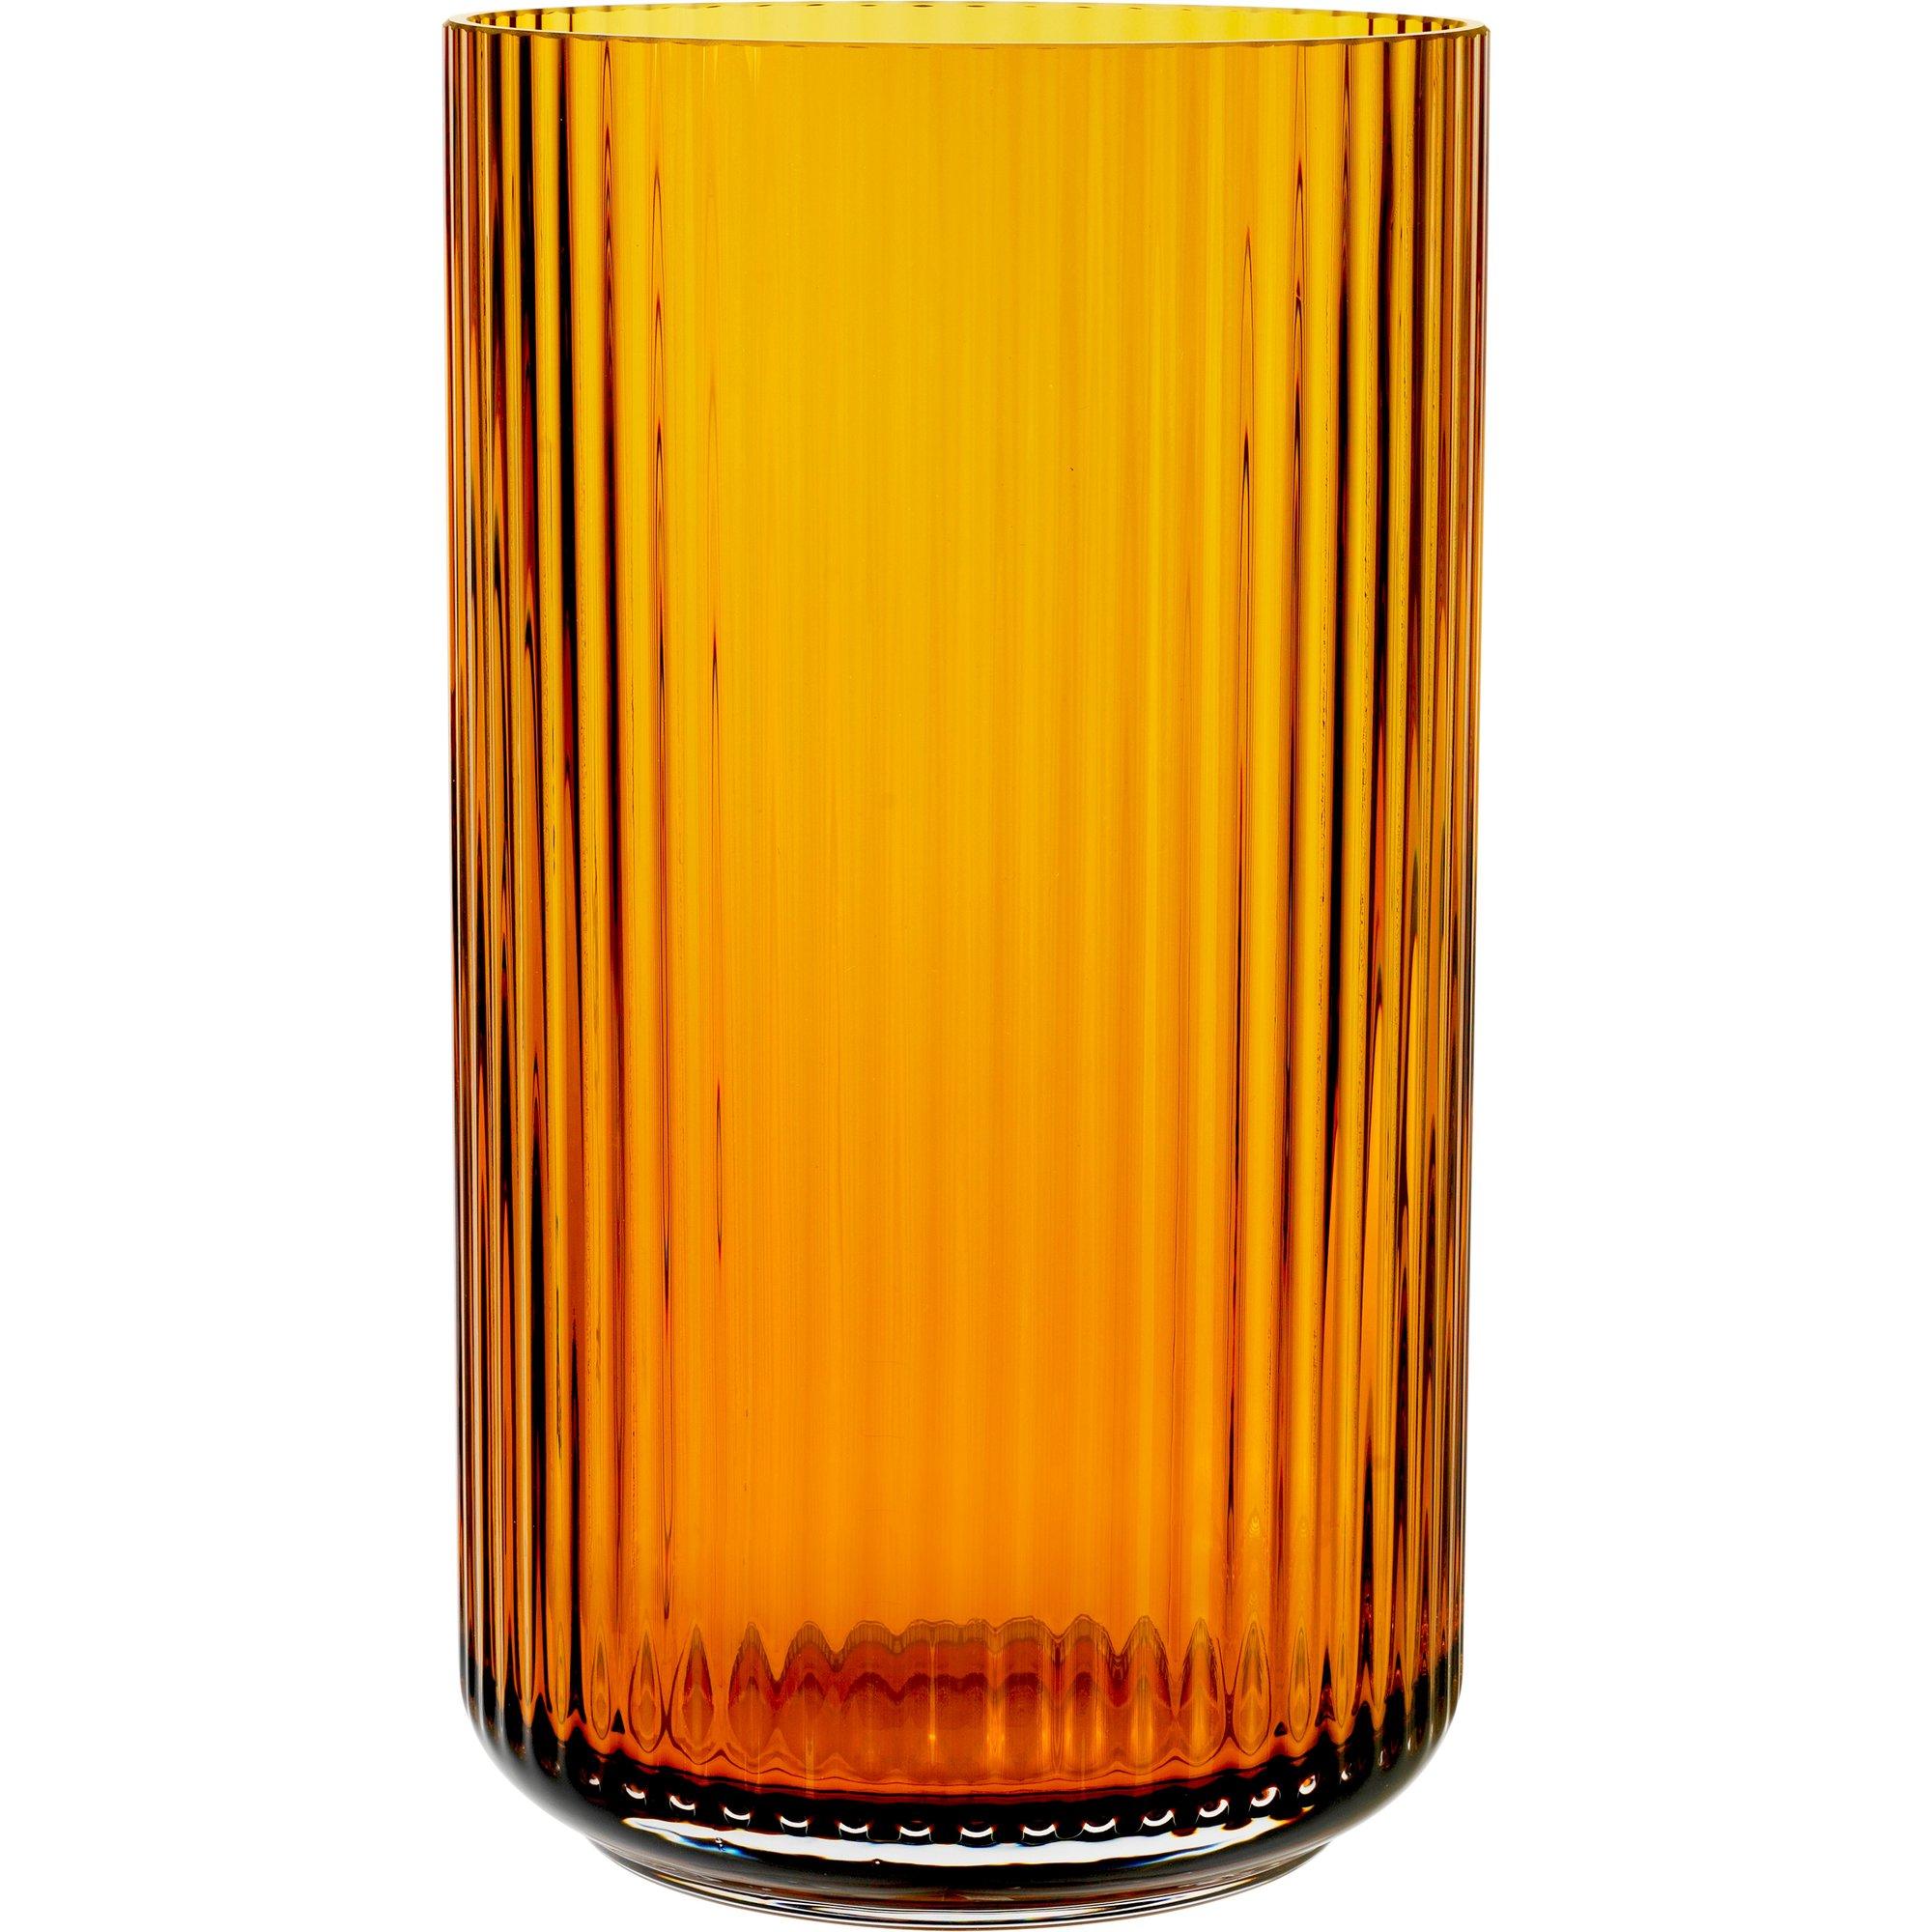 Lyngby Porcelæn Lyngbyvasen 31 cm. glas – amber